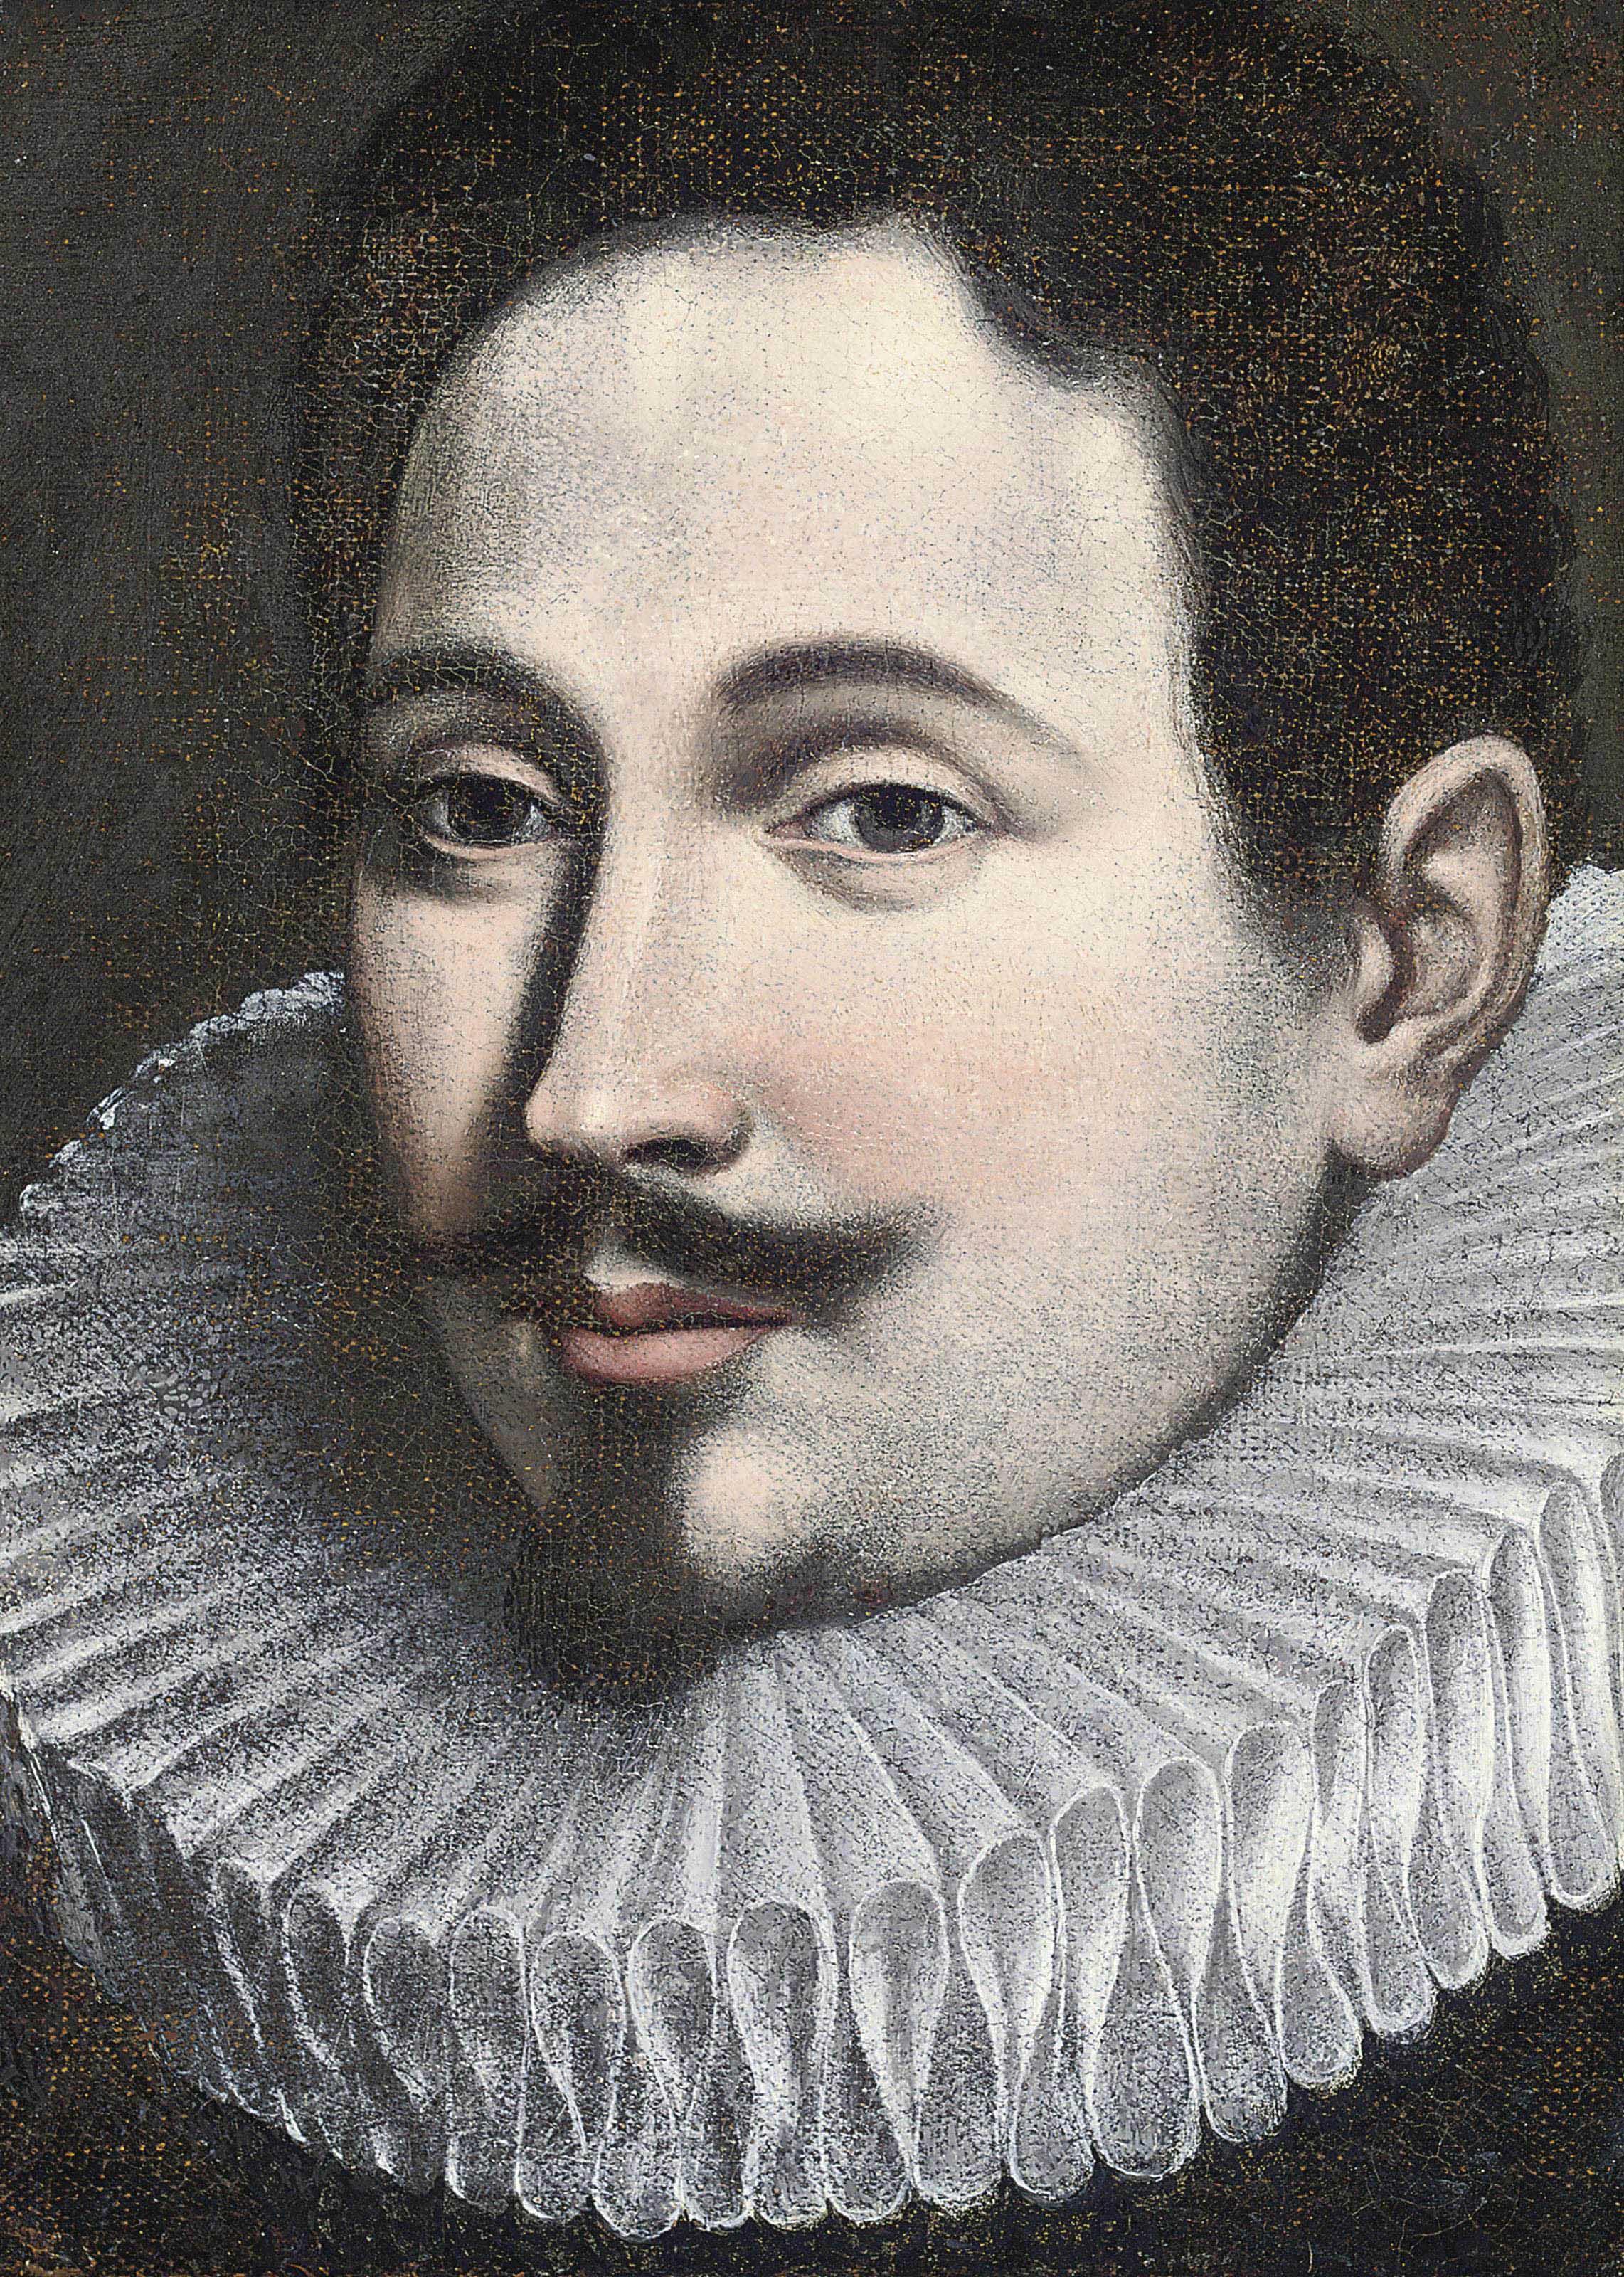 Follower of Bartolomeo Passerotti